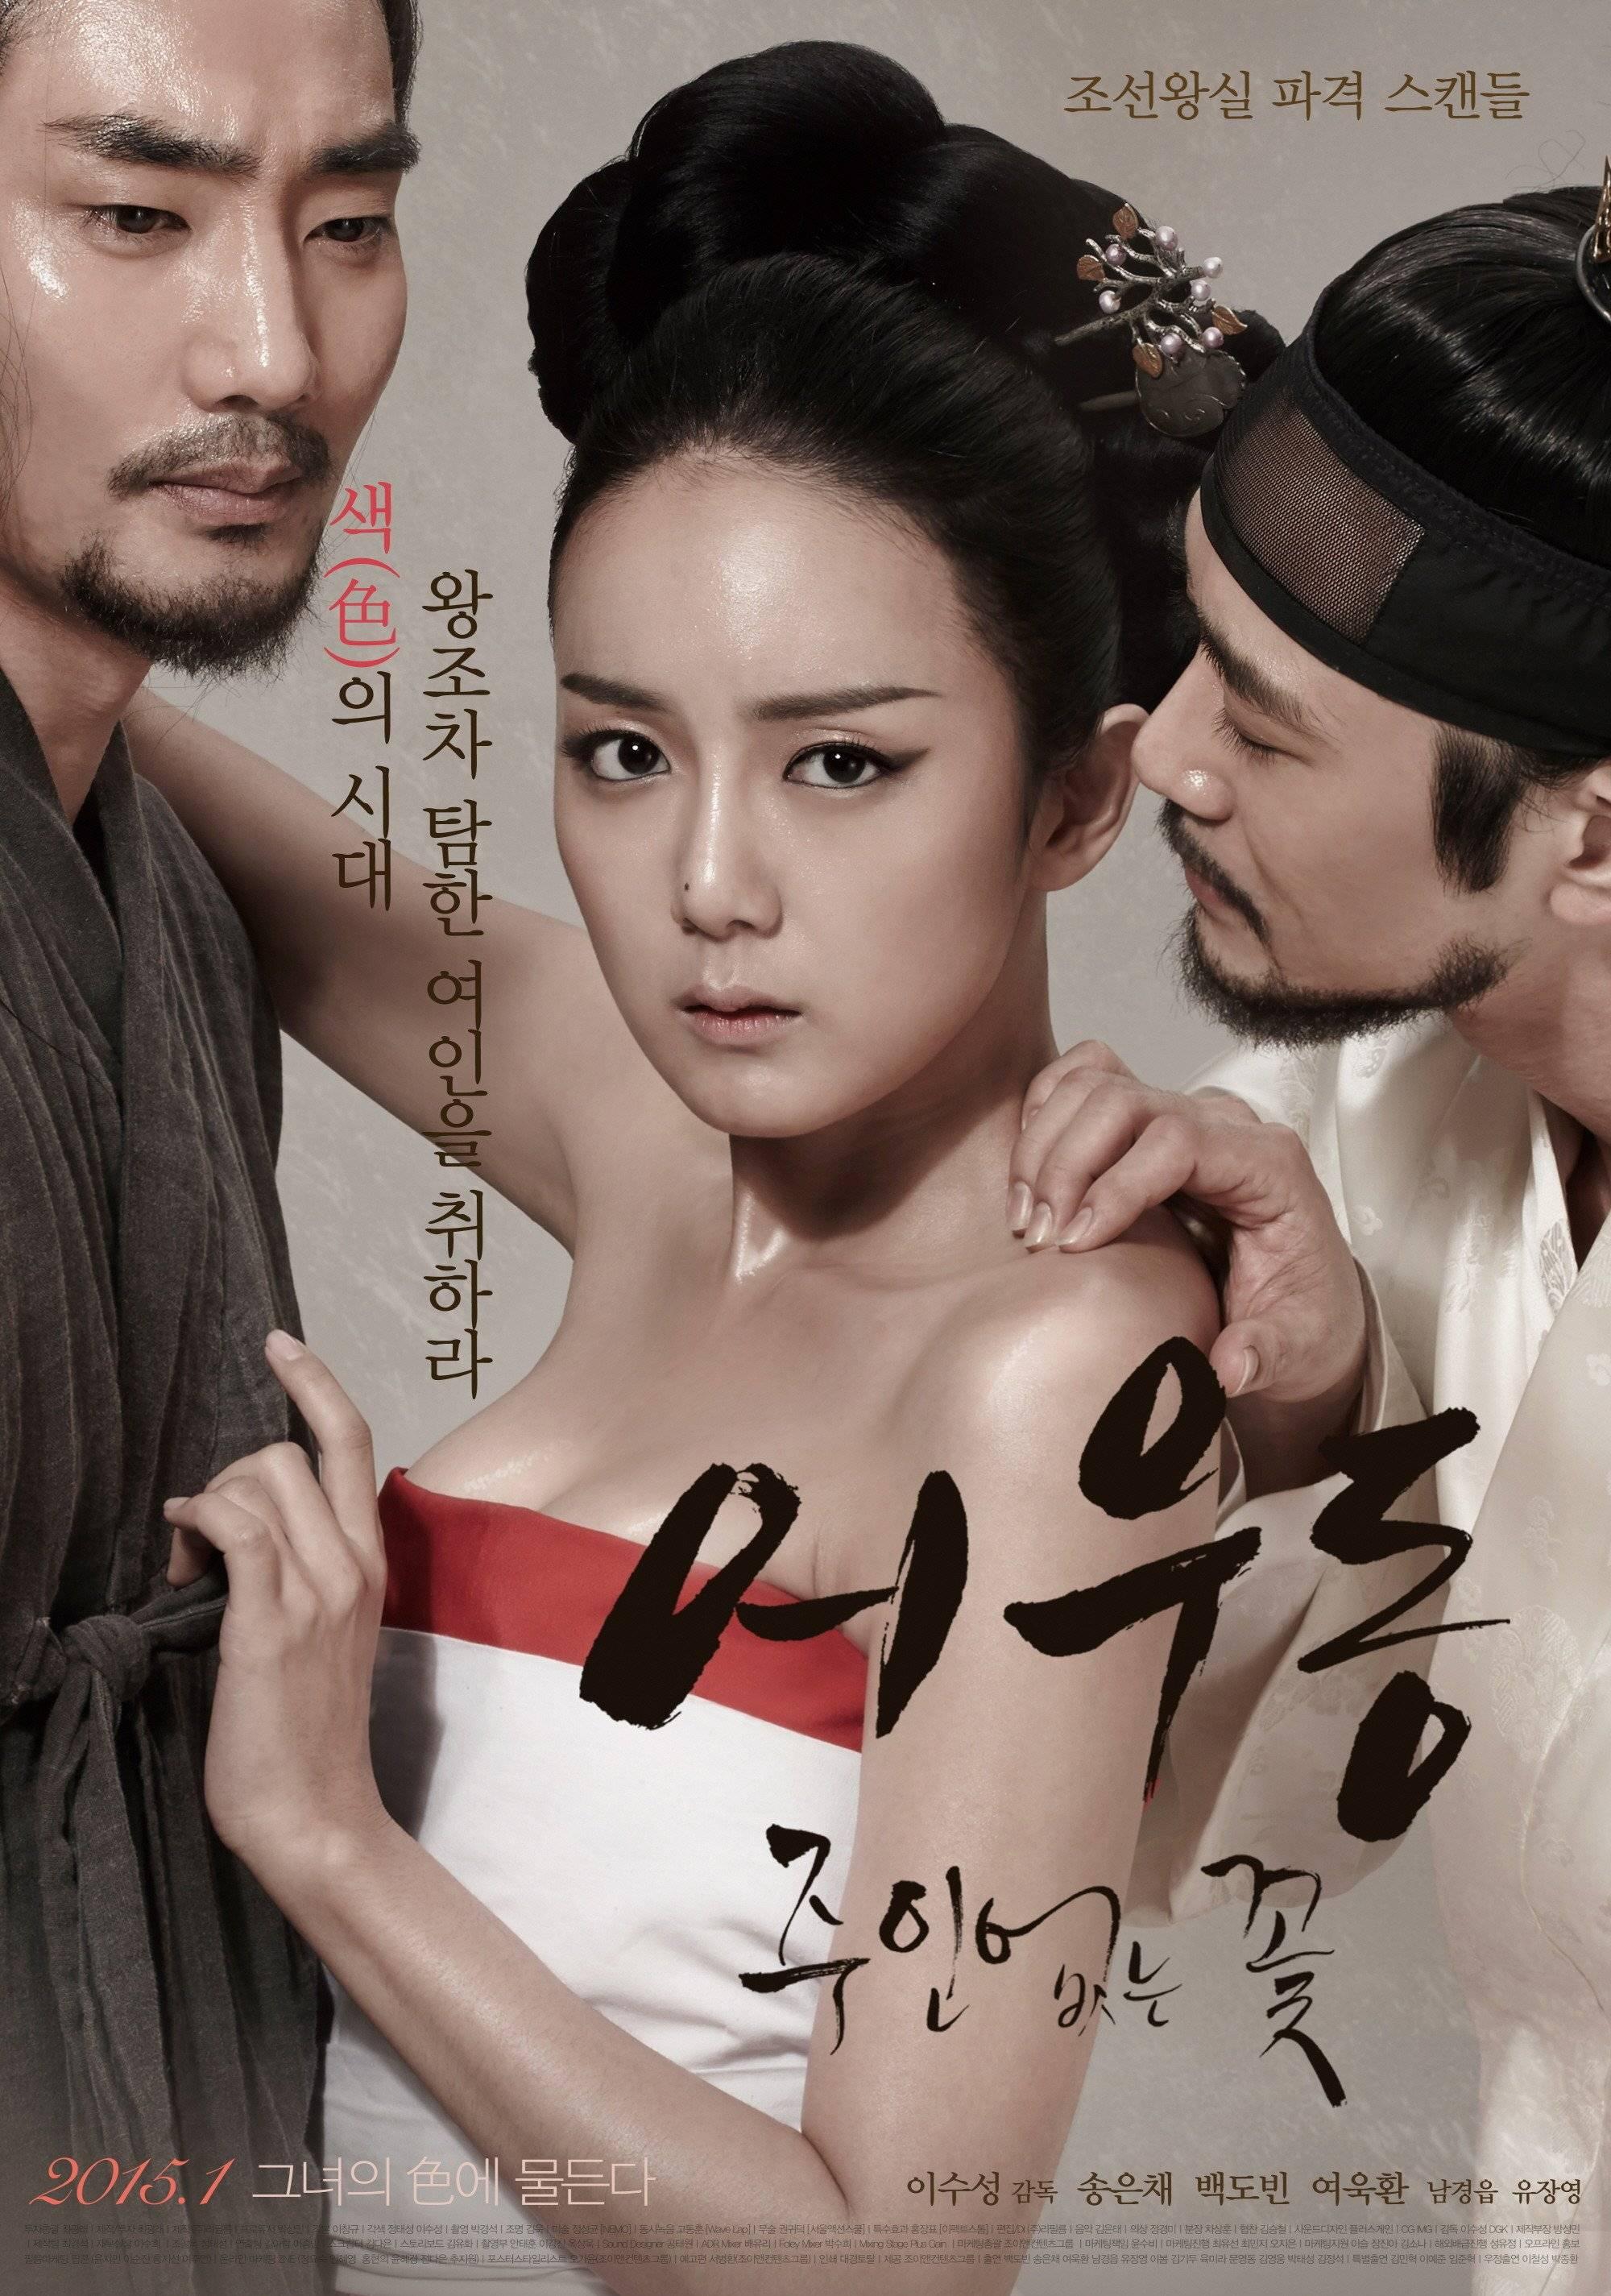 Lost Flower Eo Woo Dong Cast Korean Movie 2014